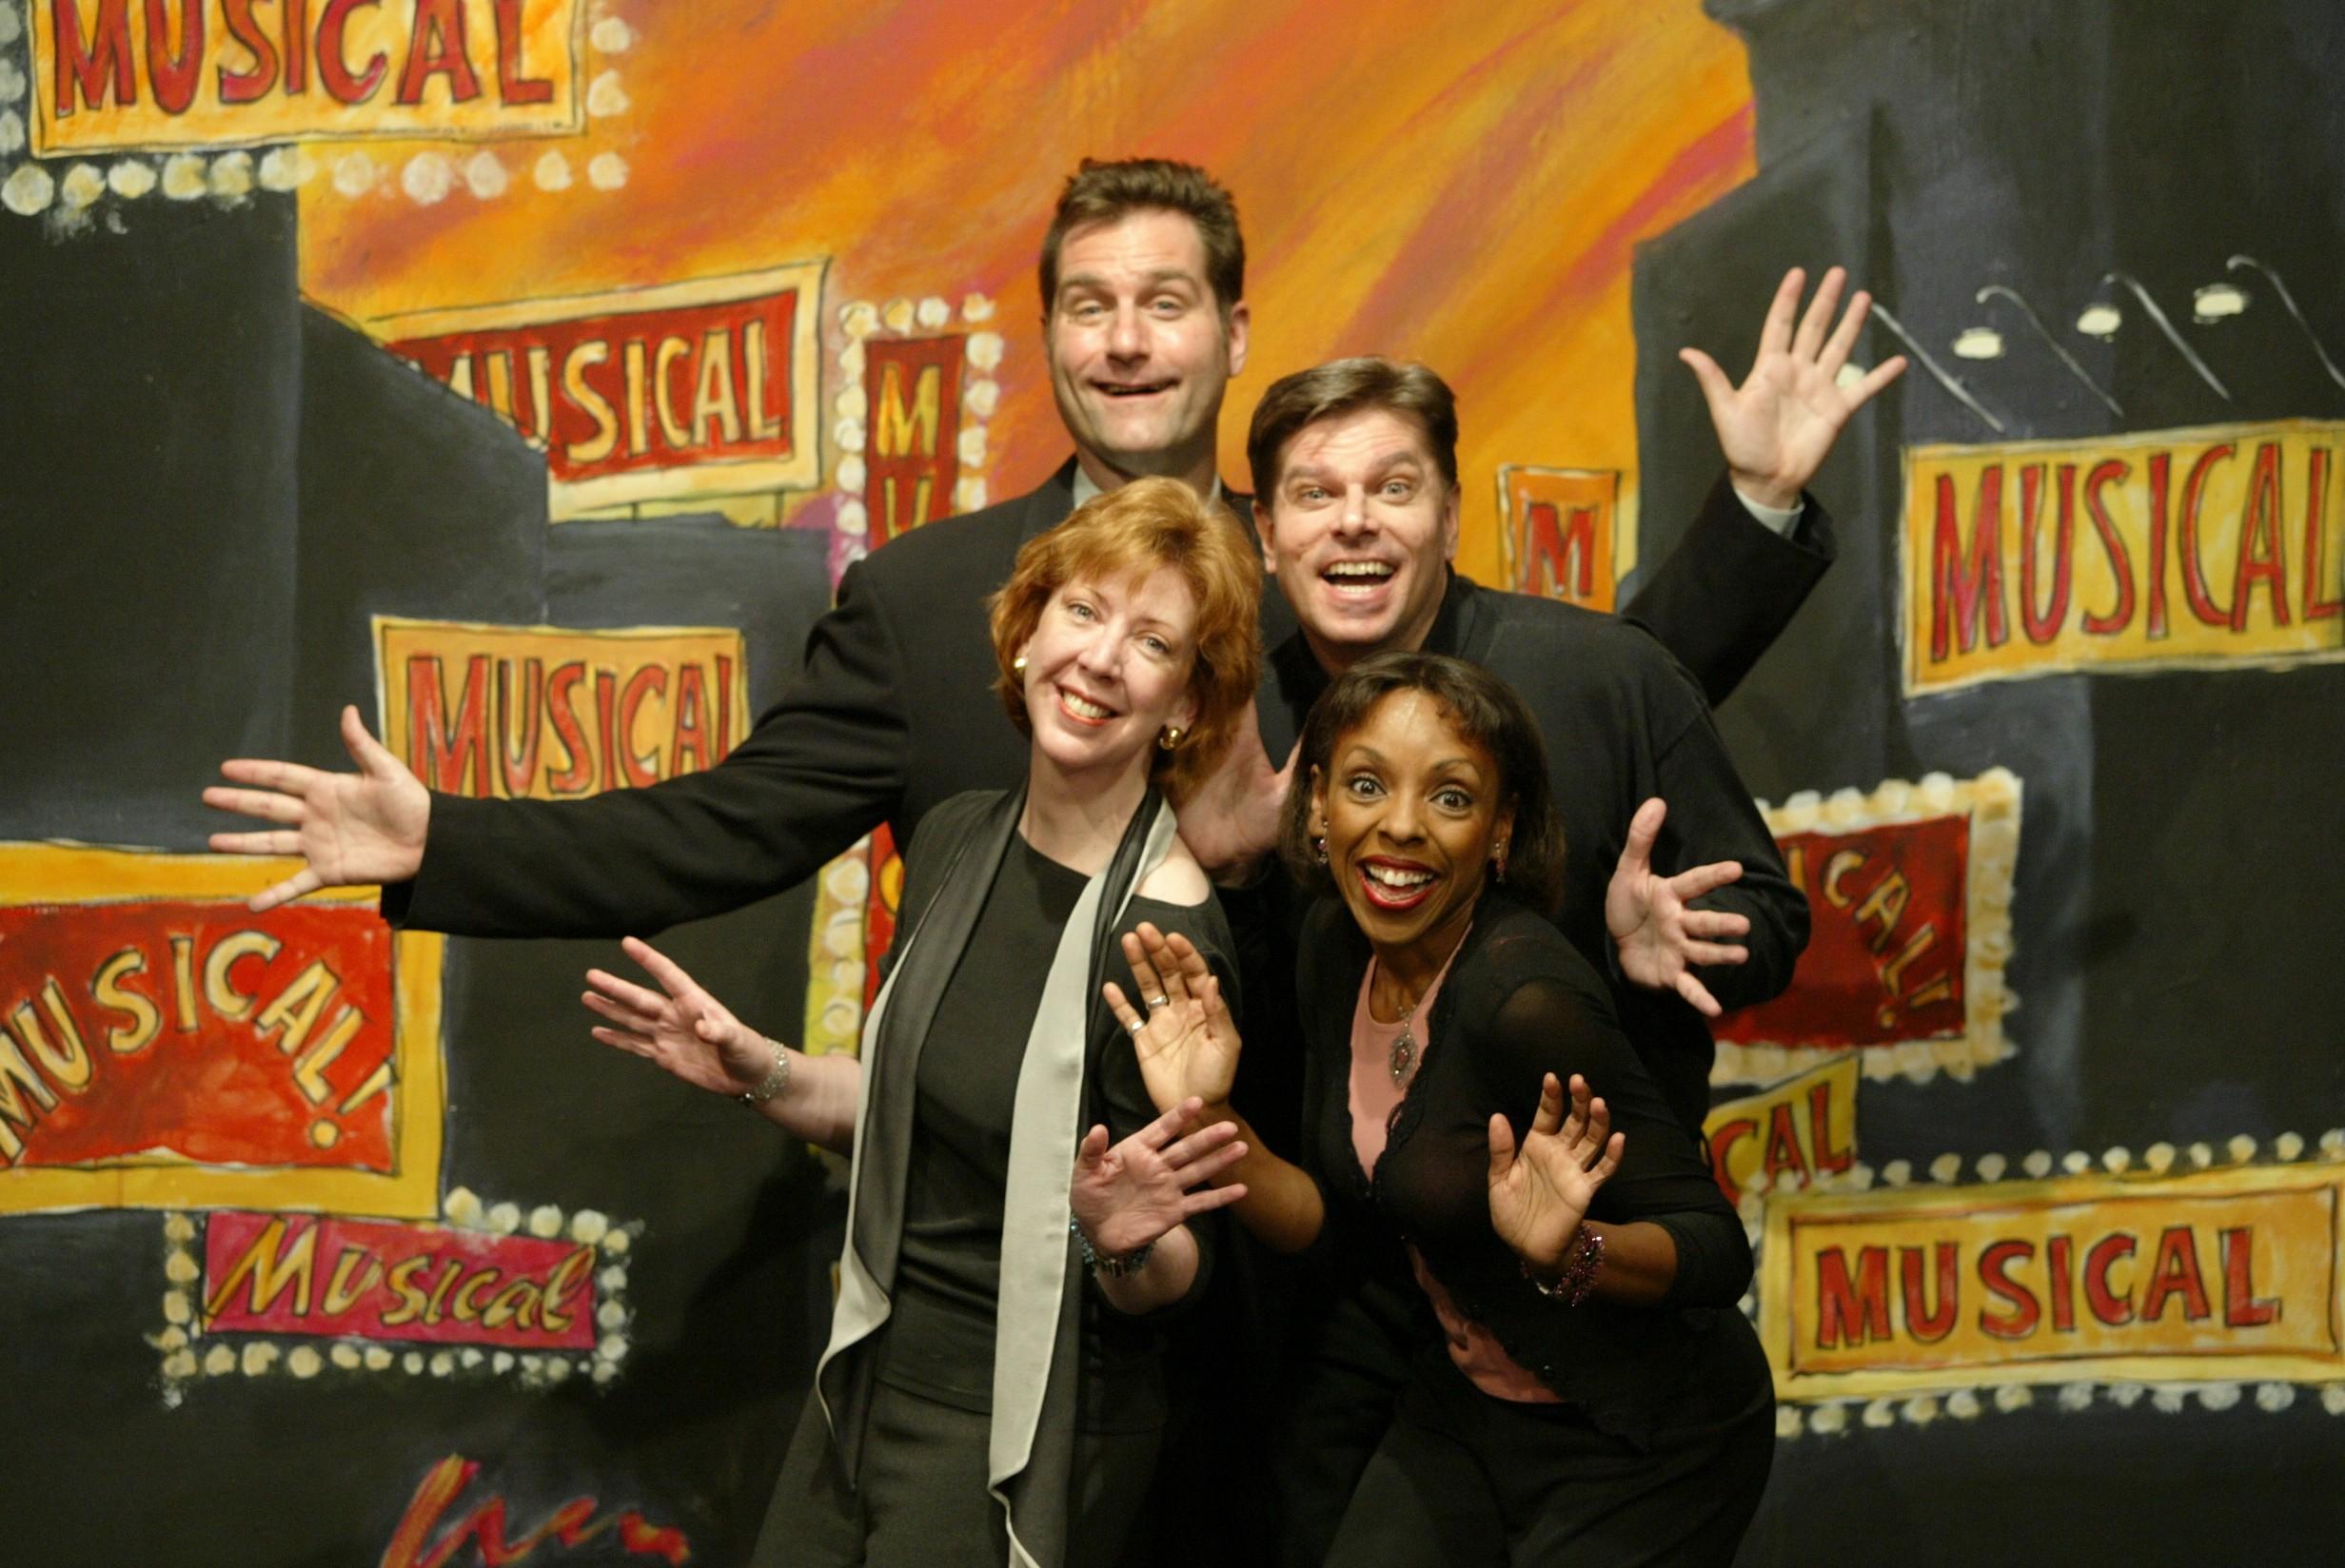 'MUSICAL OF MUSICALS' Benefit Performance 7/8, Dedicated To Memory Of Original Cast Member Lovette George